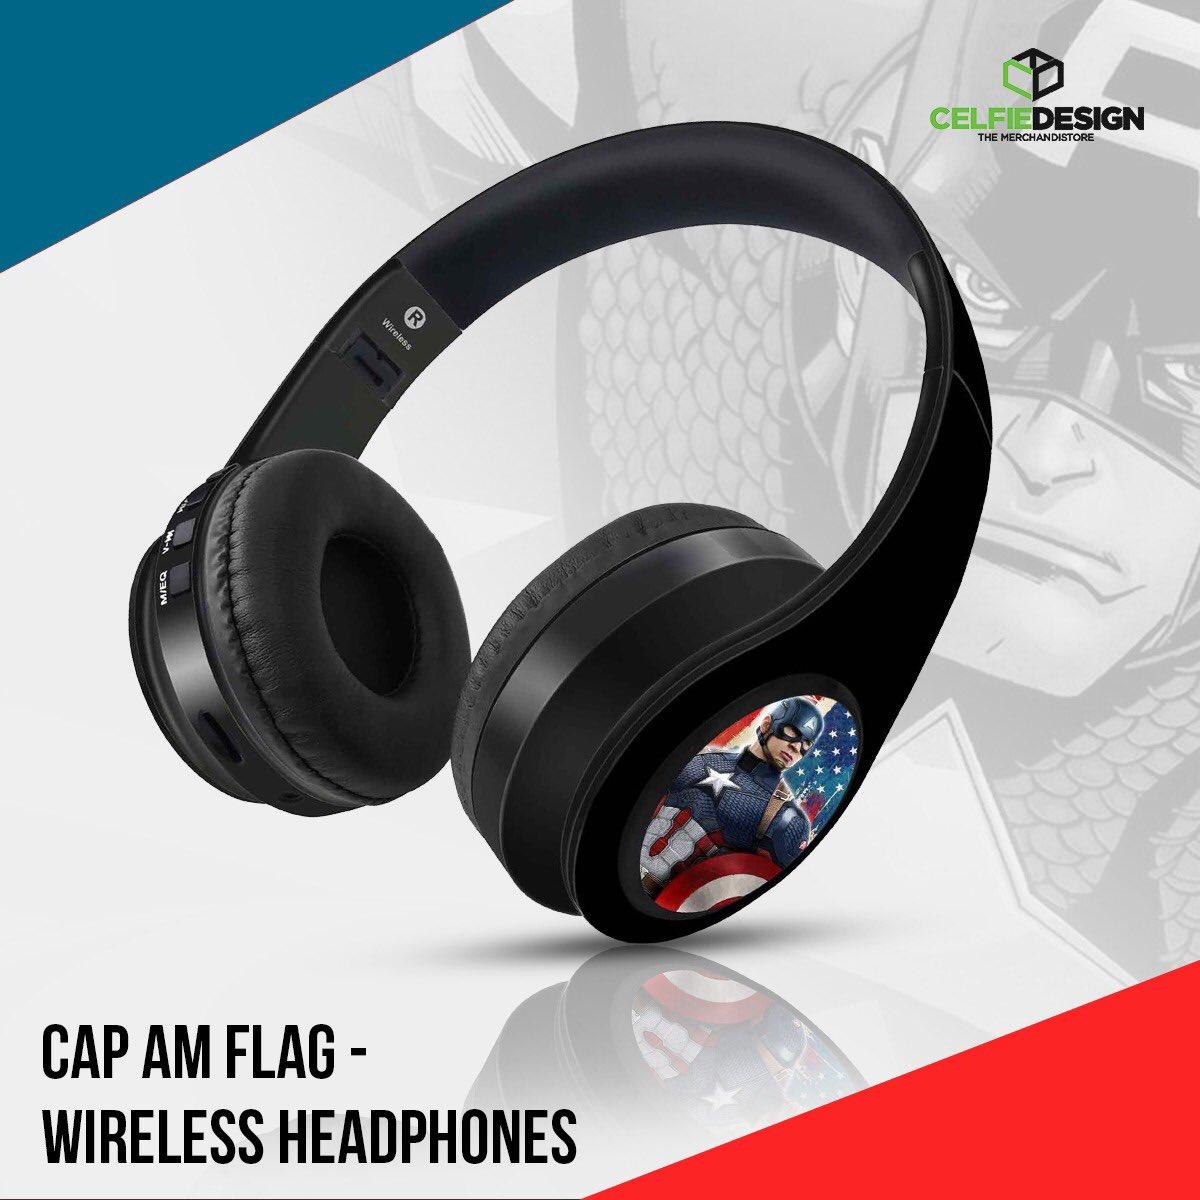 Headphones over hearing always ? #headphones #hearing #captainamerica #wireless #wirelessheadphones #tech #love #mood #quarantine #entertainment #celfie #celfiedesignpic.twitter.com/wEgozqI5Cr